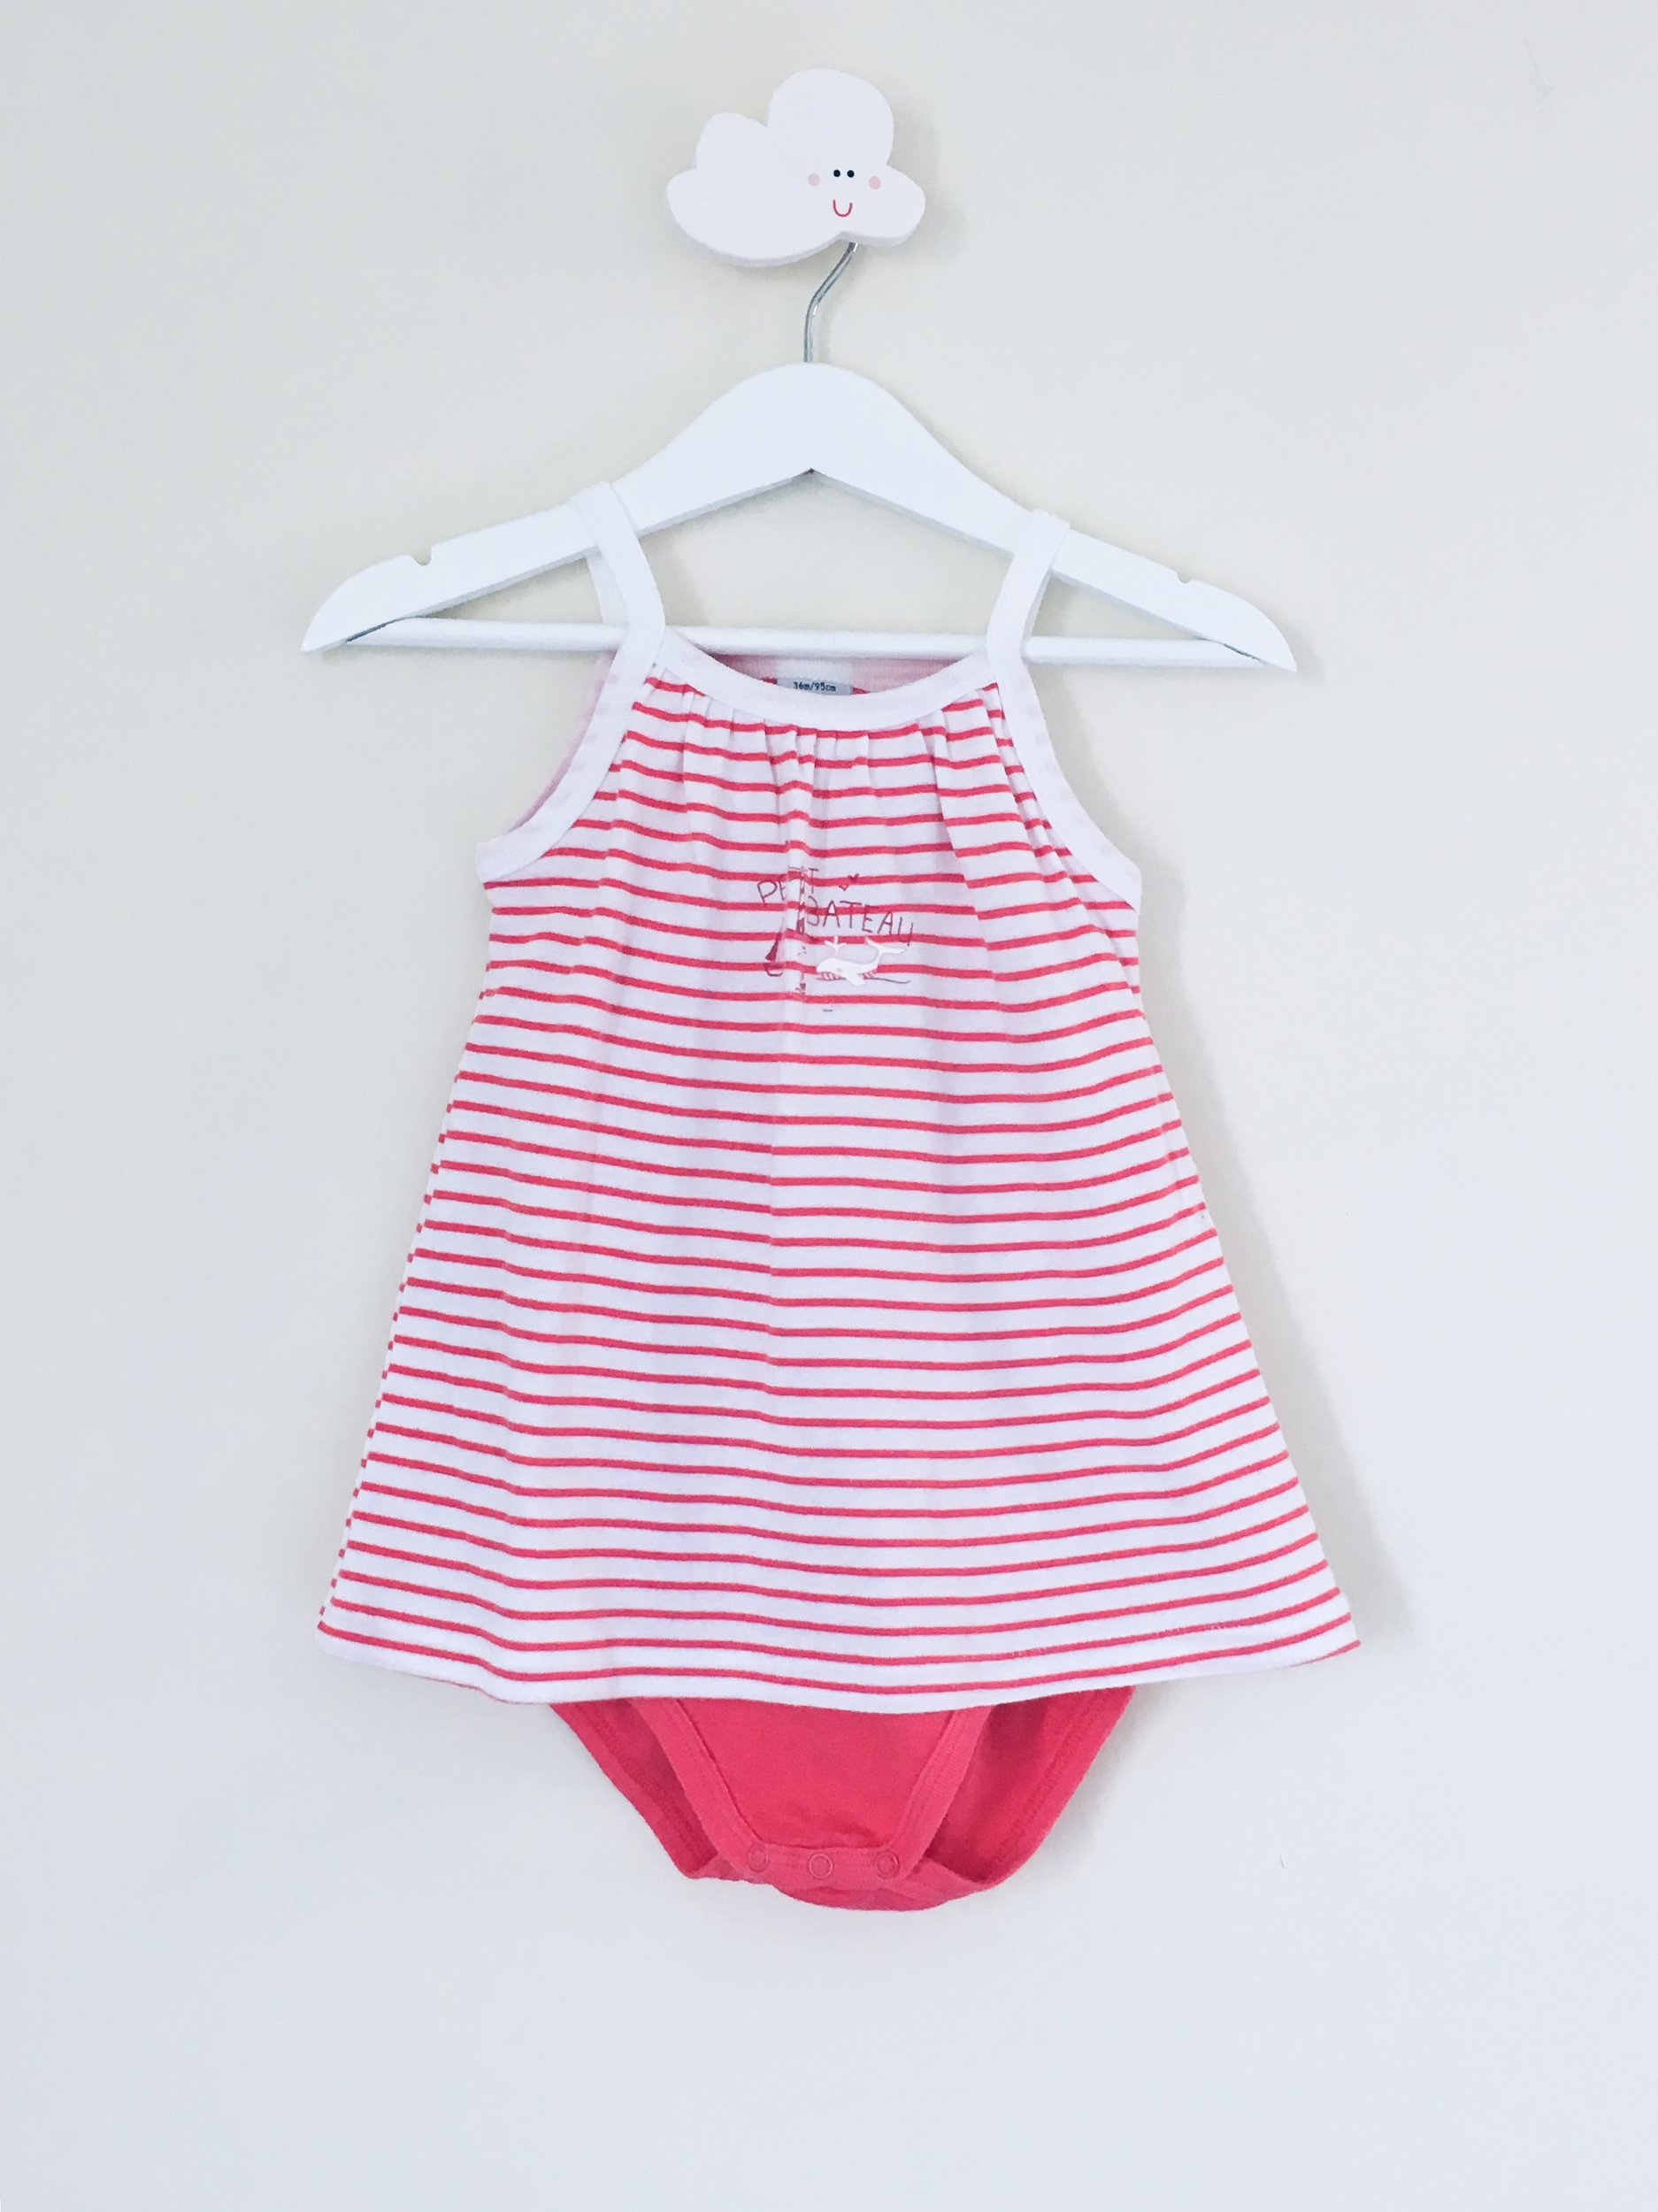 Petit Bateau Robe Body Integre 36 Mois Bebe Fille Robes Jupes Toupourlou